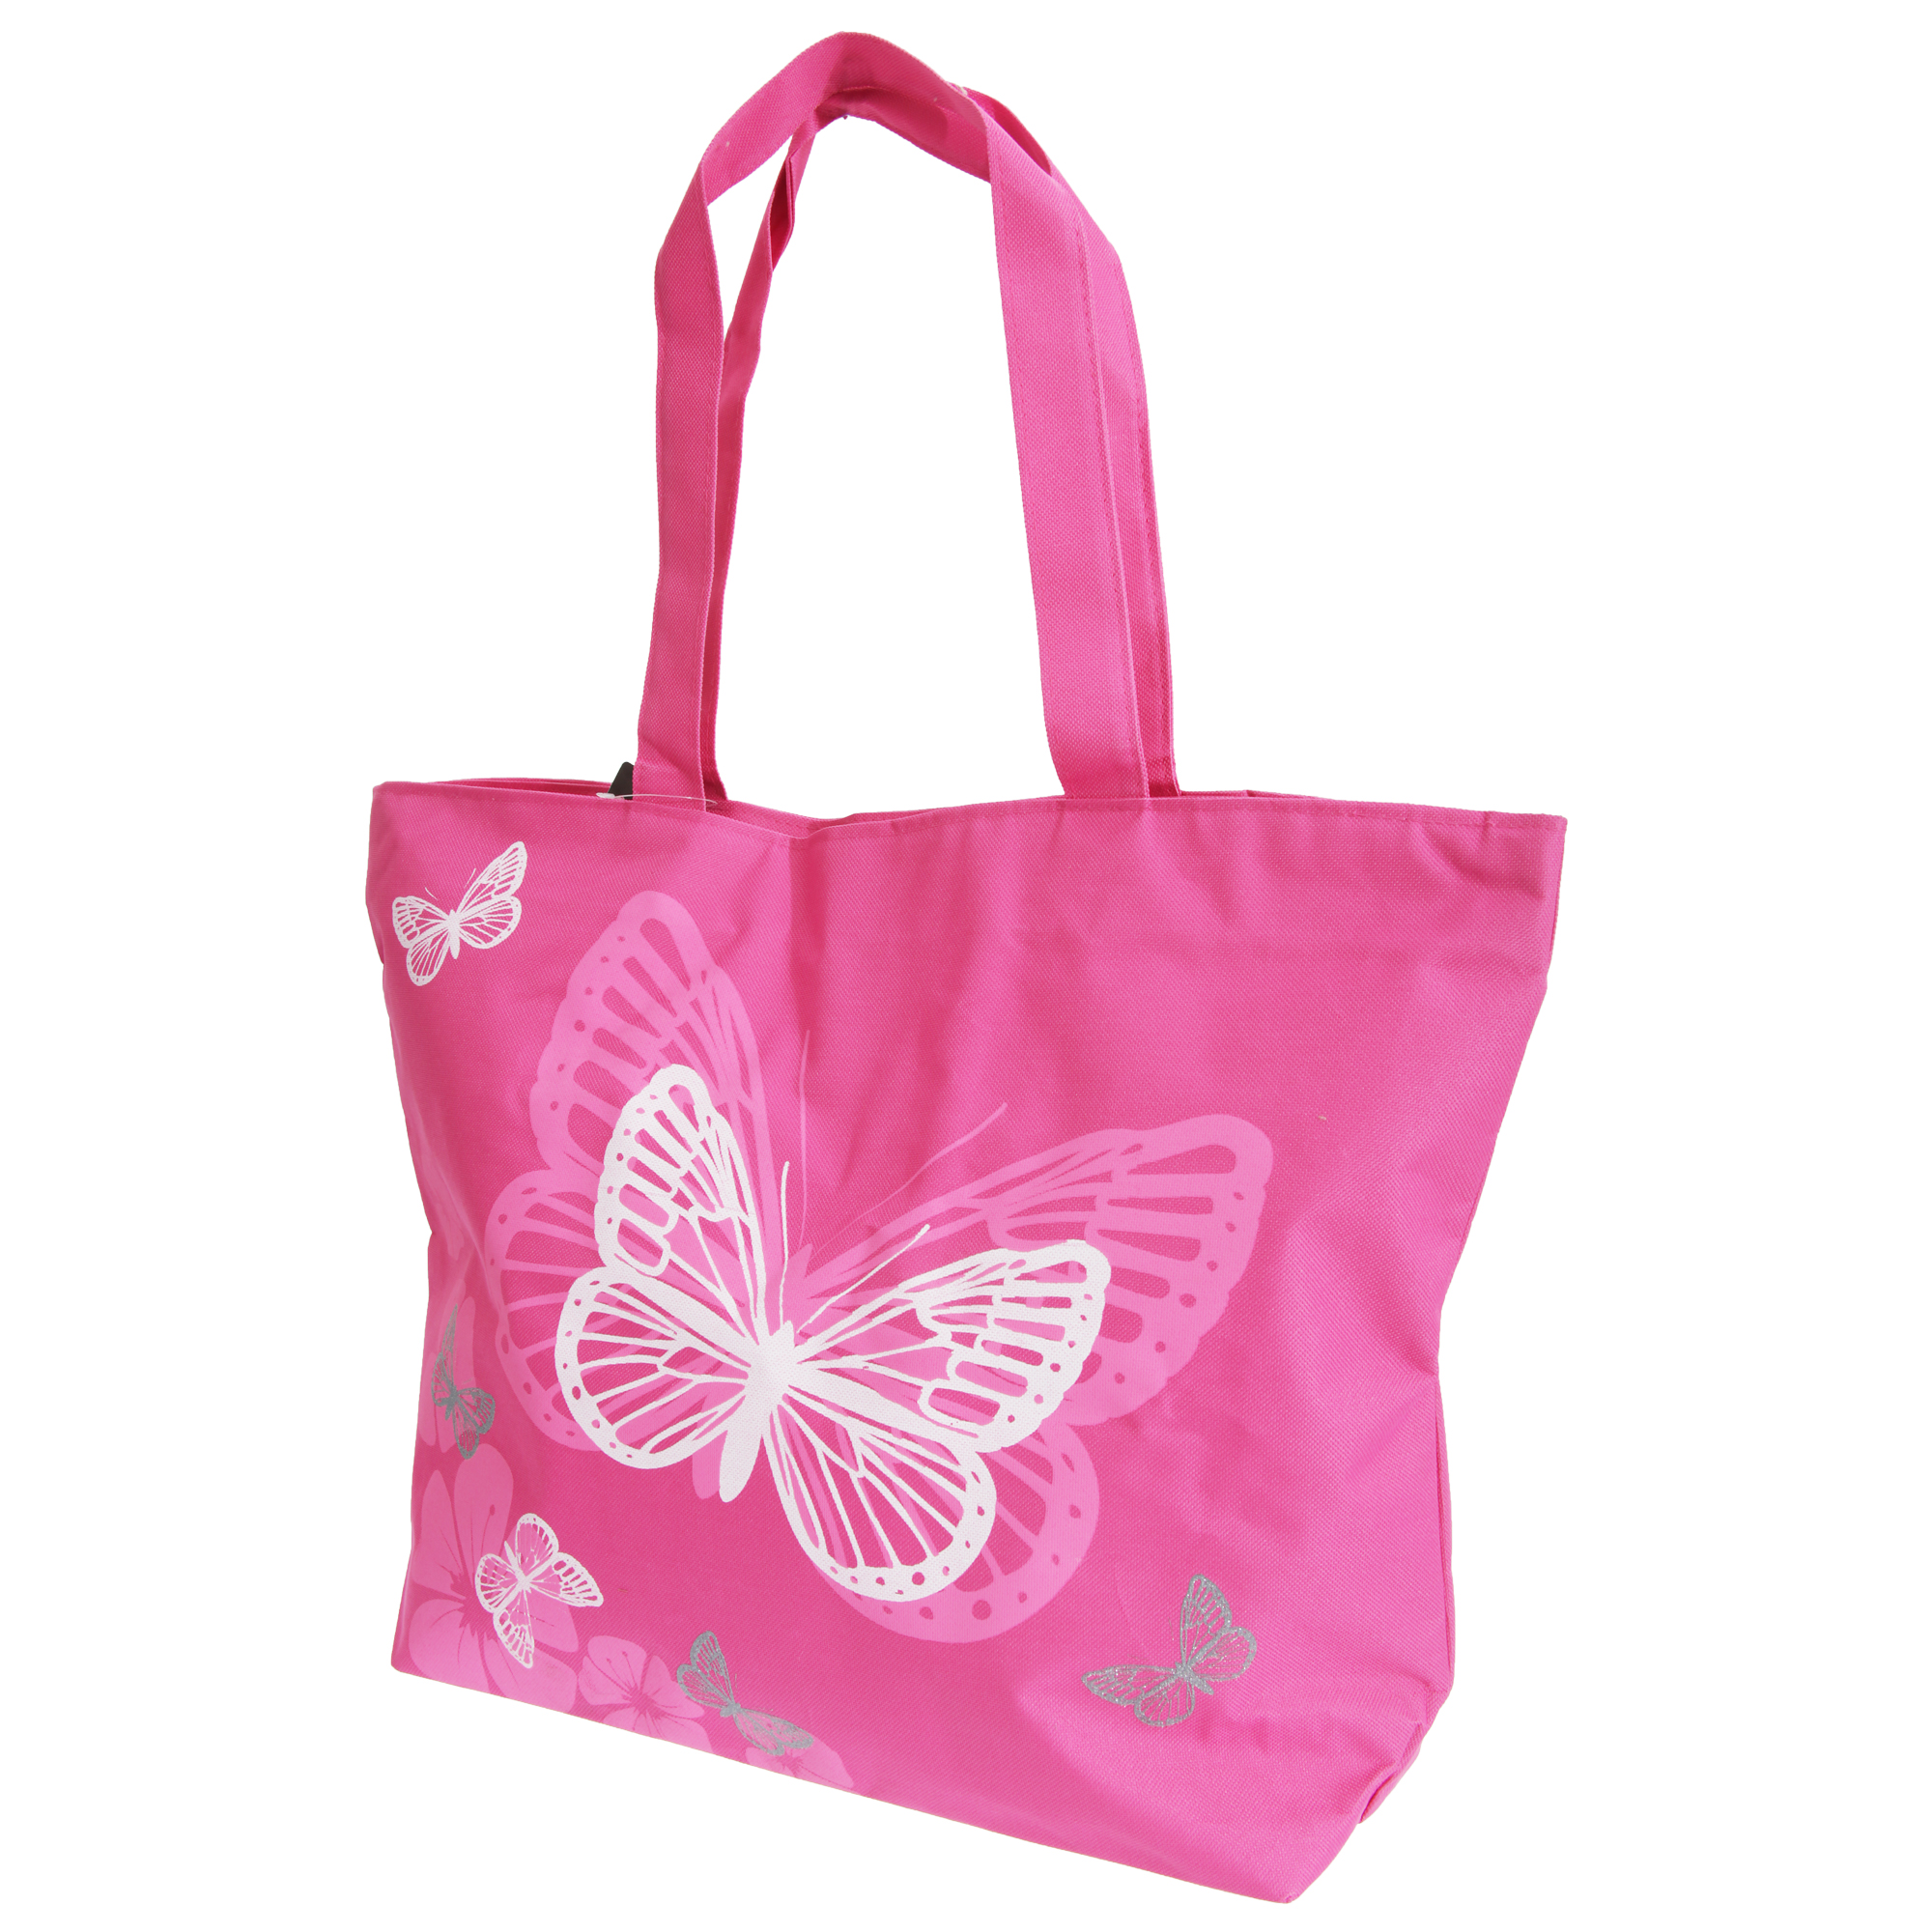 FLOSO Womens/Ladies Floral Butterfly Design Handbag (One Size) (Fuchsia)